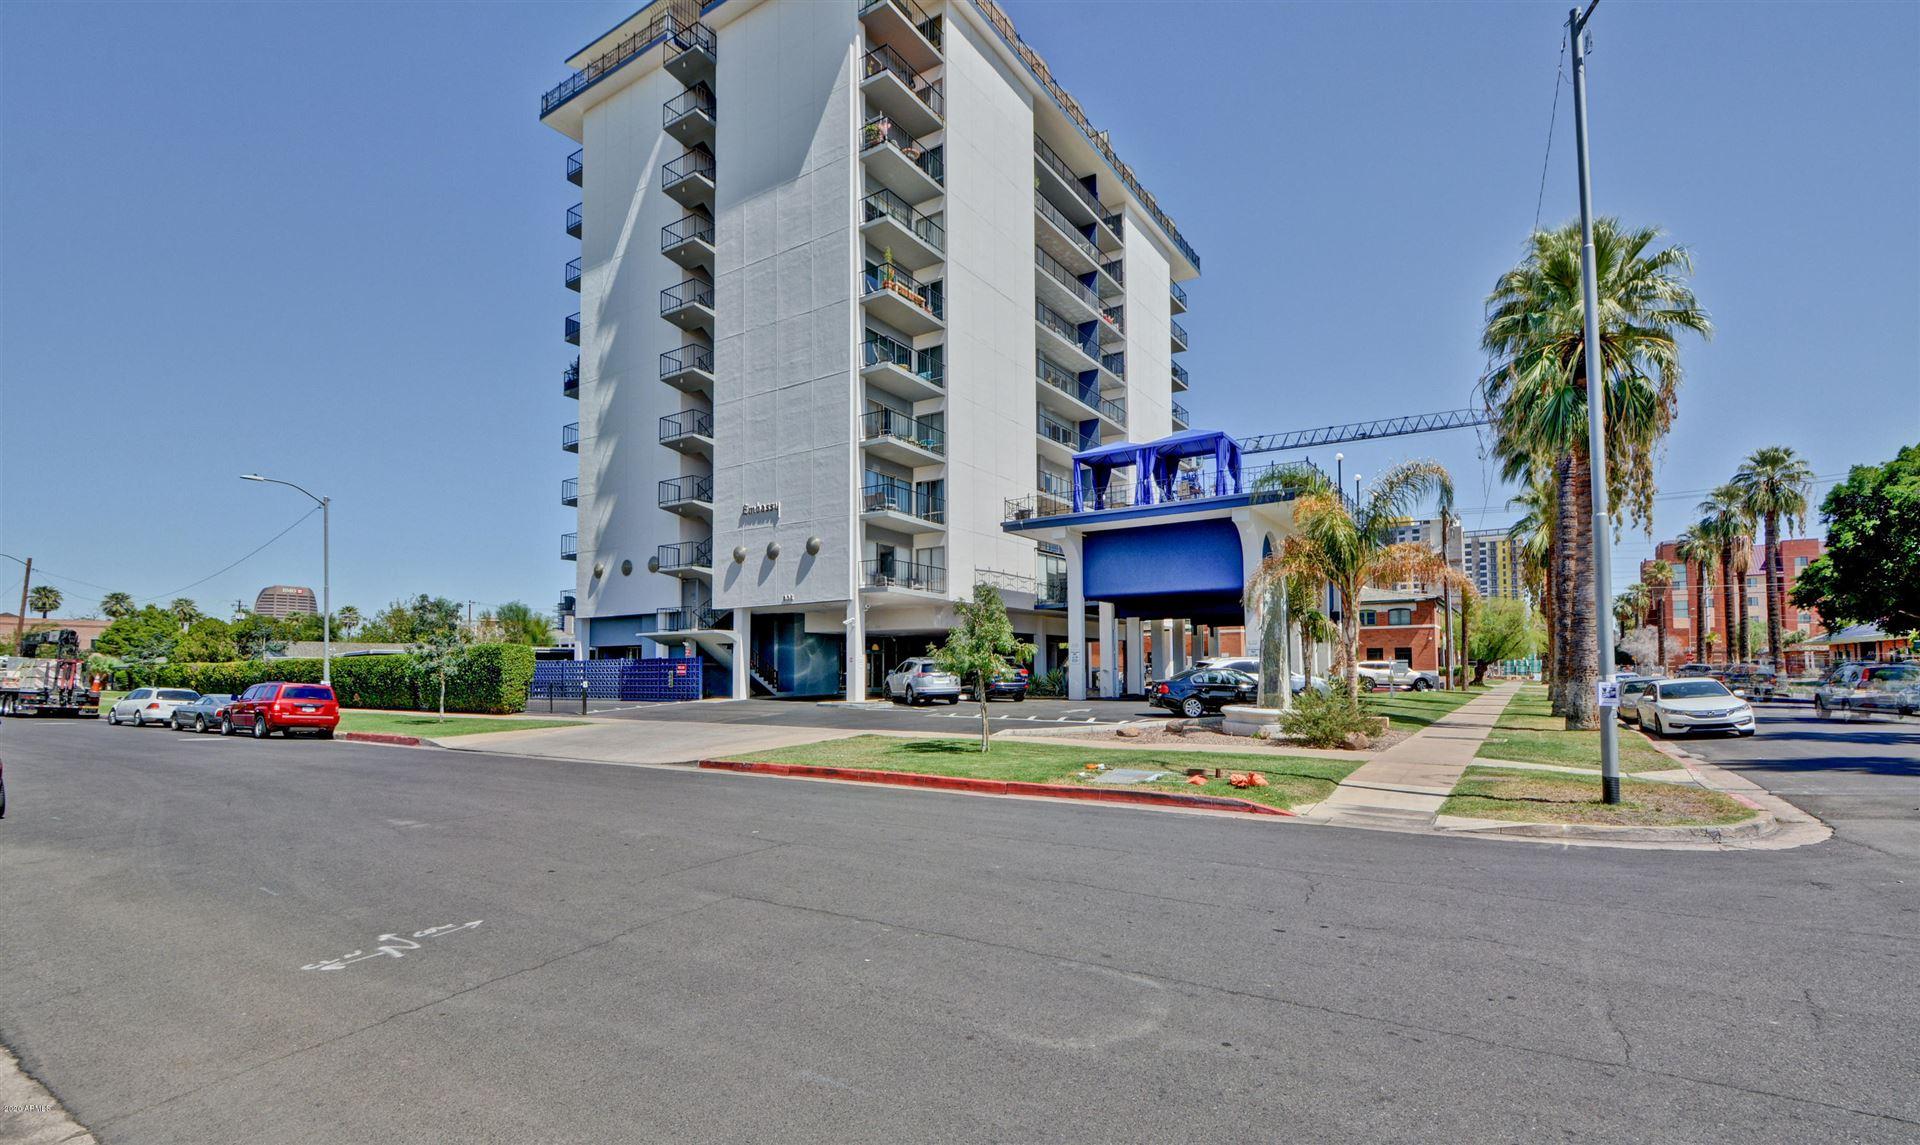 805 N 4TH Avenue #403, Phoenix, AZ 85003 - #: 6044549